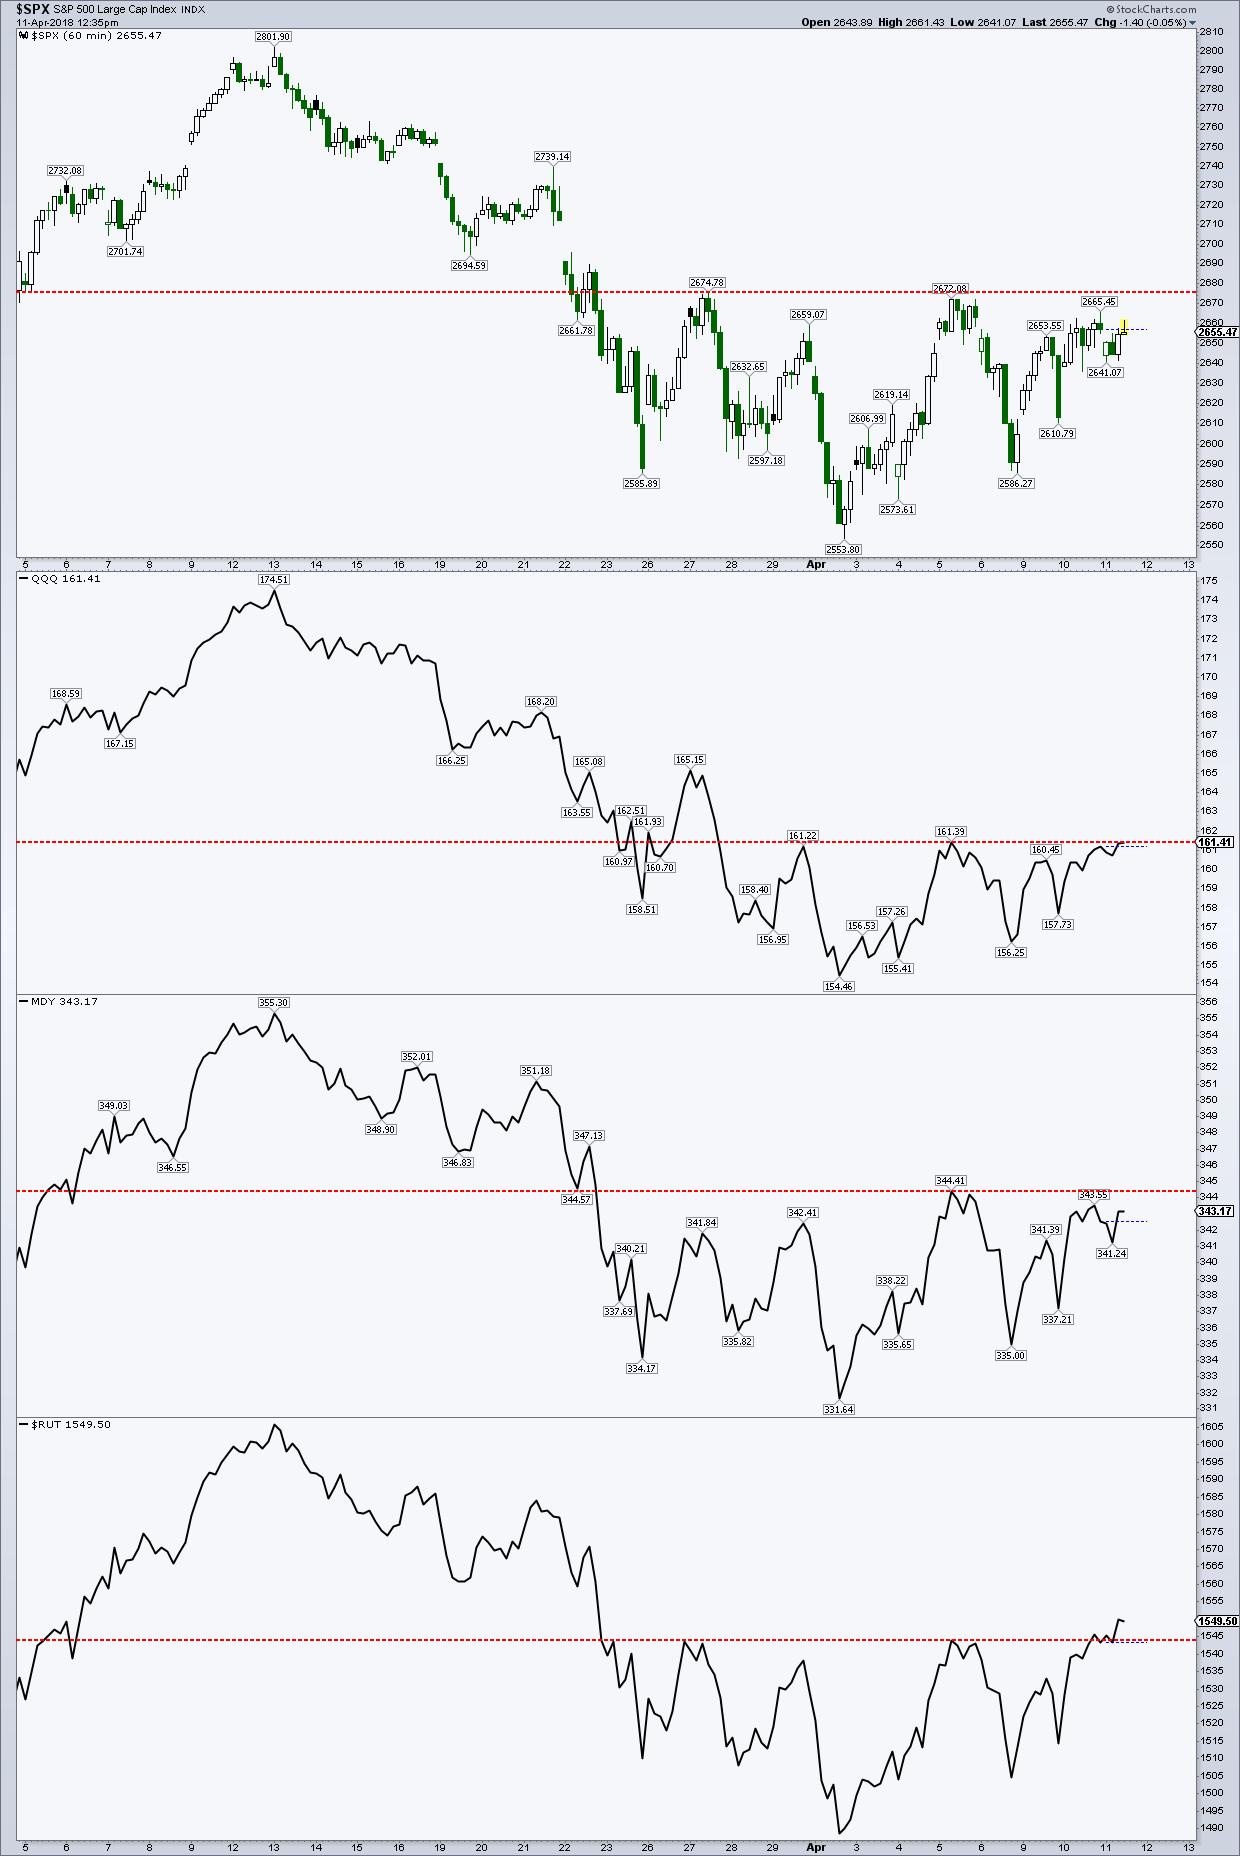 stock market indices inverse head shoulders bullish chart_investing news april 11